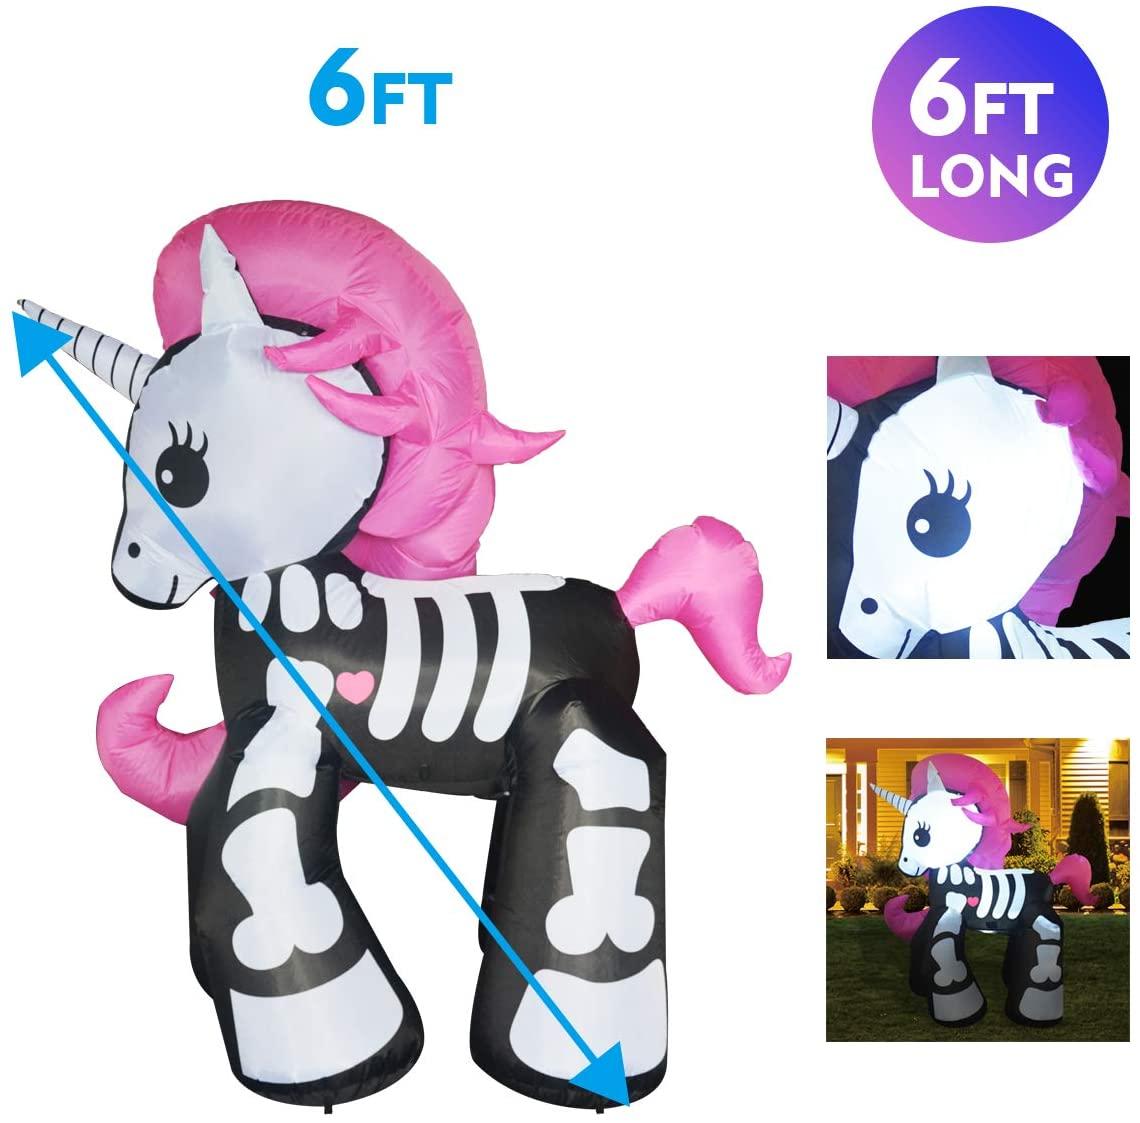 Inflatable Skeleton Unicorn Halloween Lawn Decoration